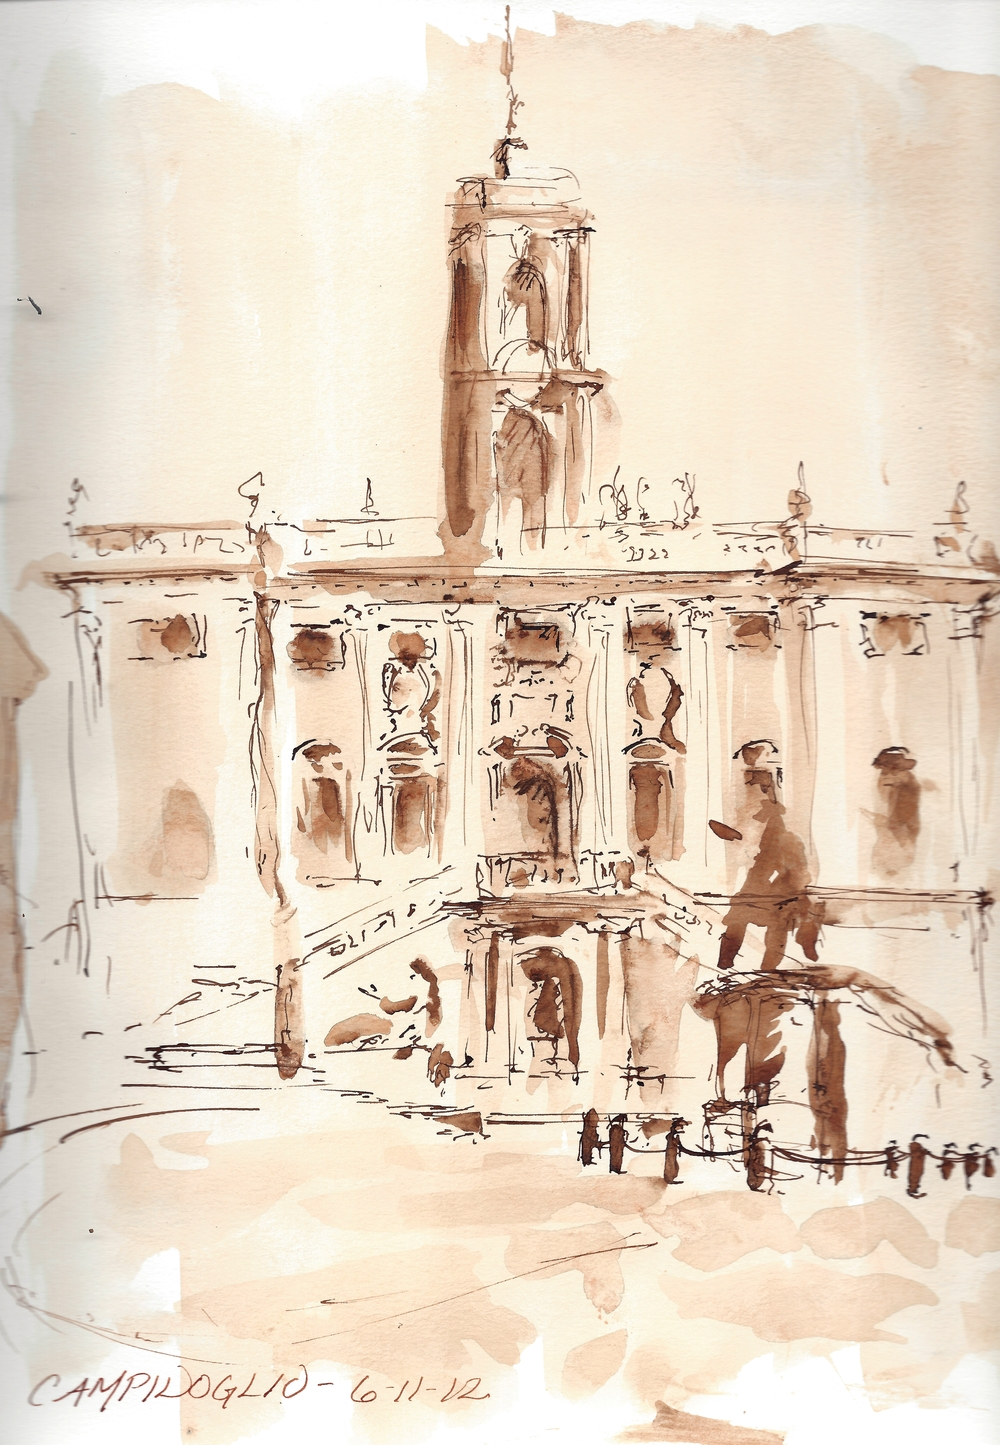 Pen and Ink,Michelangelo's Campidoglio